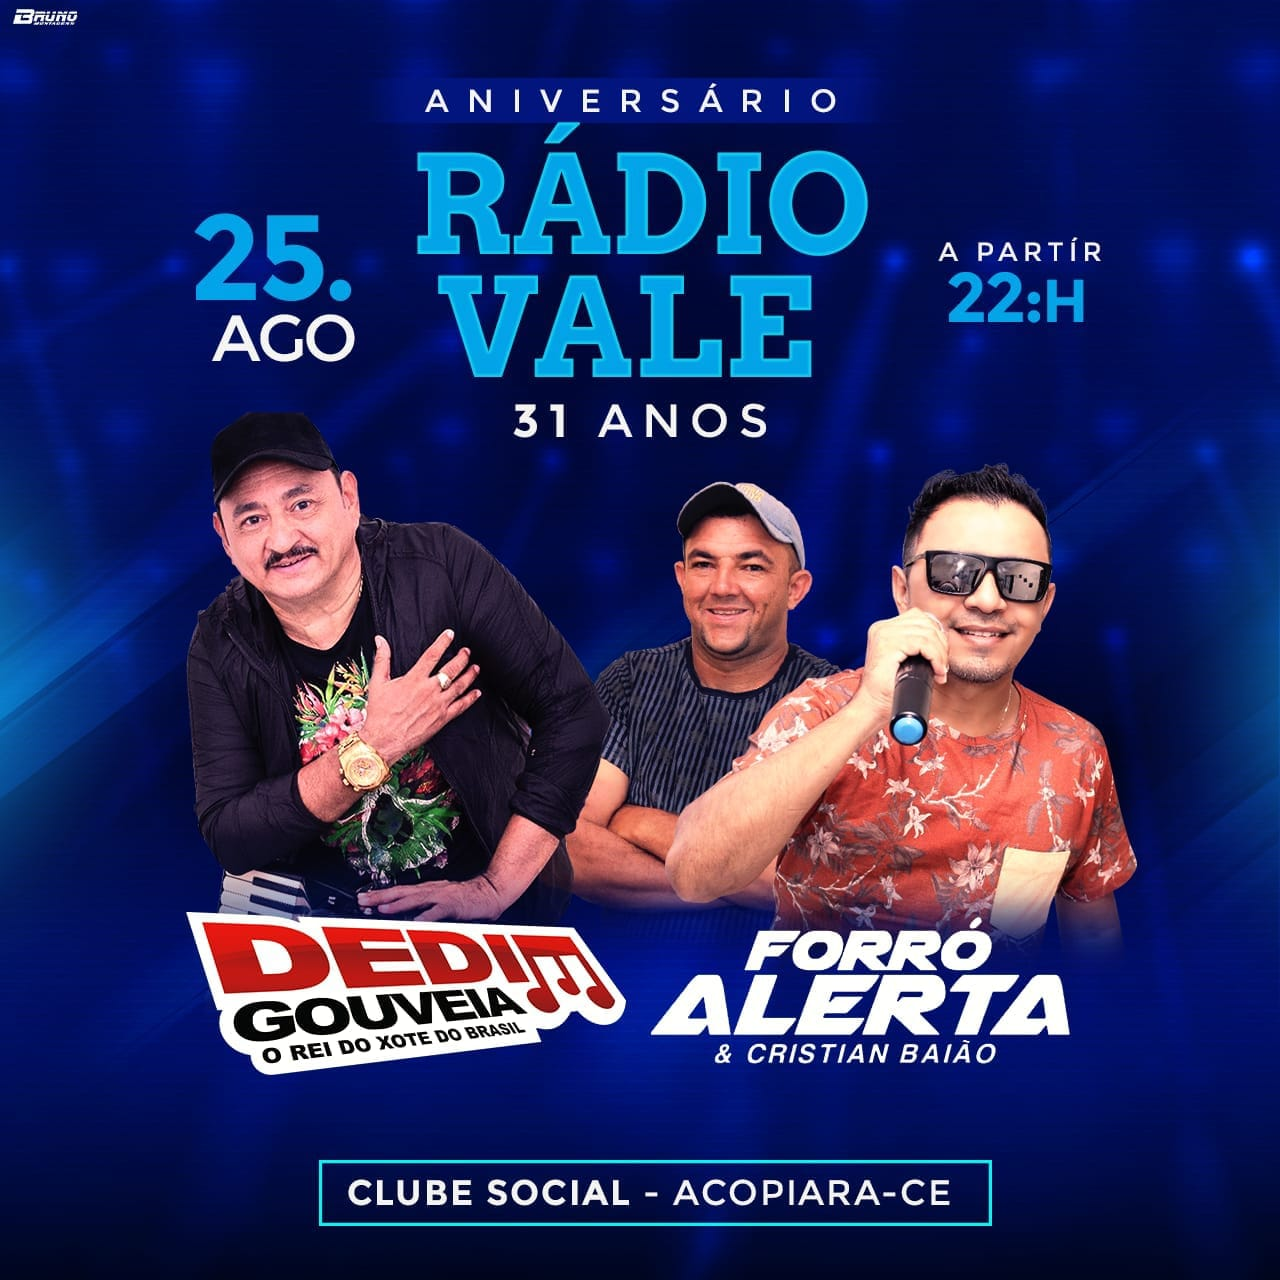 FESTA DE ANIVERSARIO DA RÁDIO VALE ACOPIARA 31 ANOS